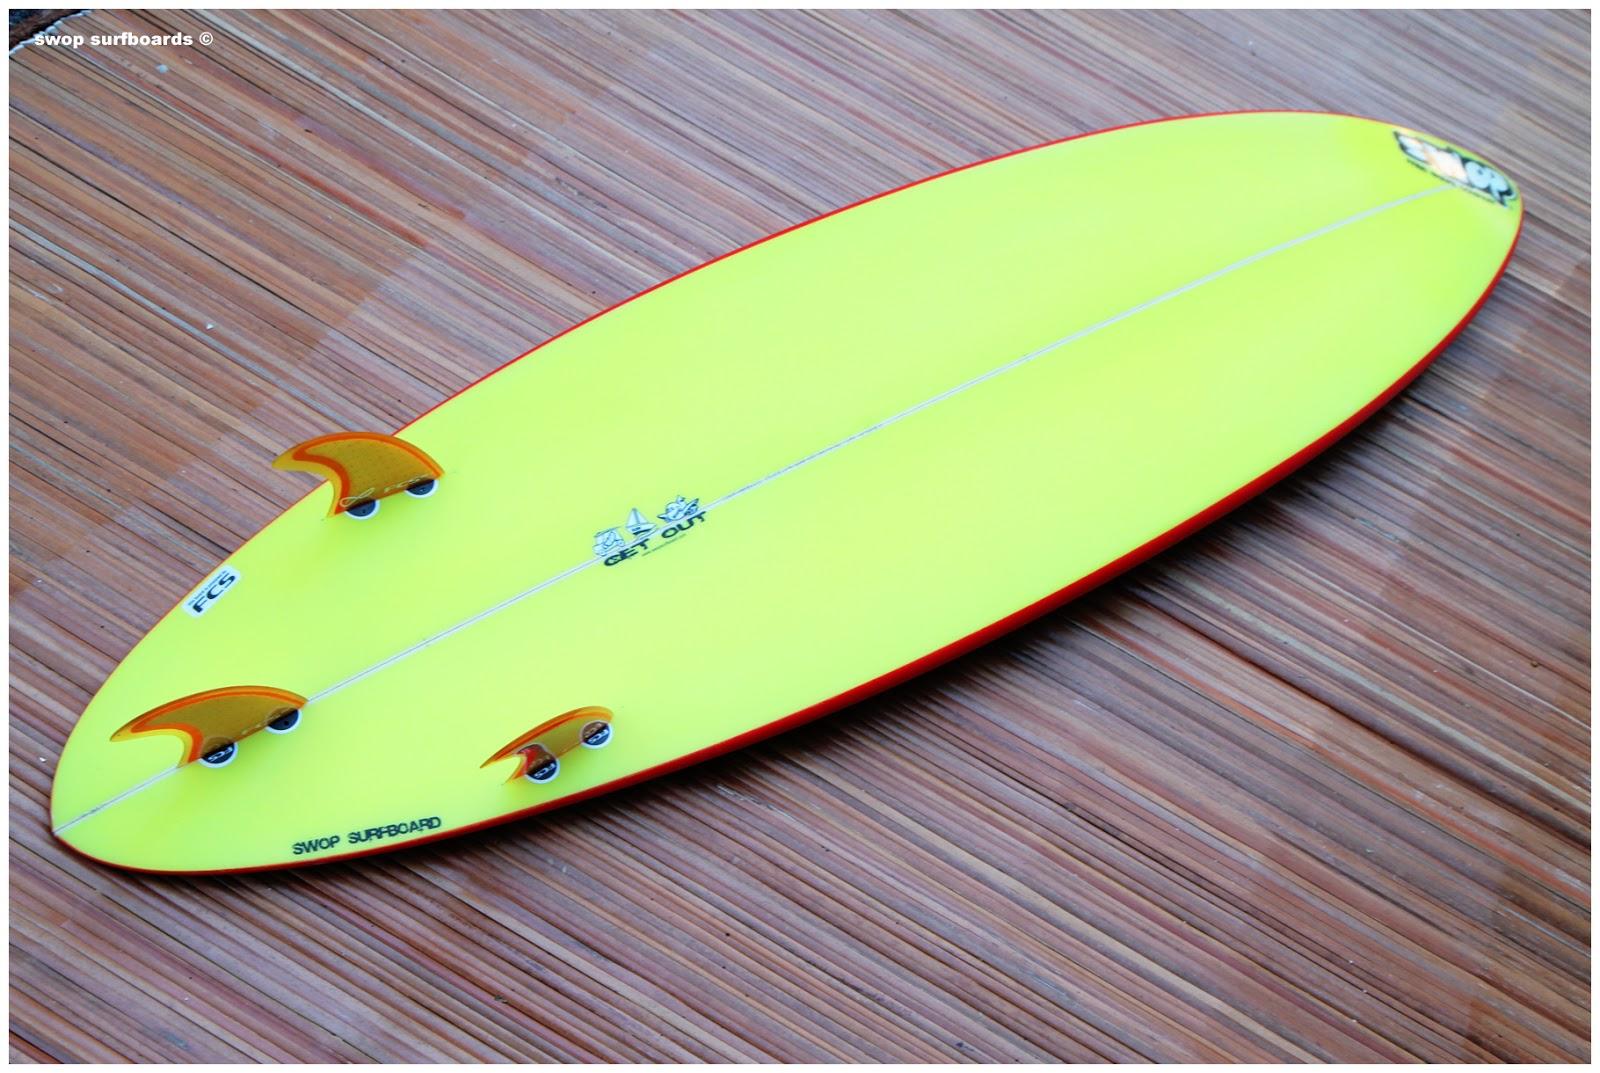 swop surfboards mini gun. Black Bedroom Furniture Sets. Home Design Ideas